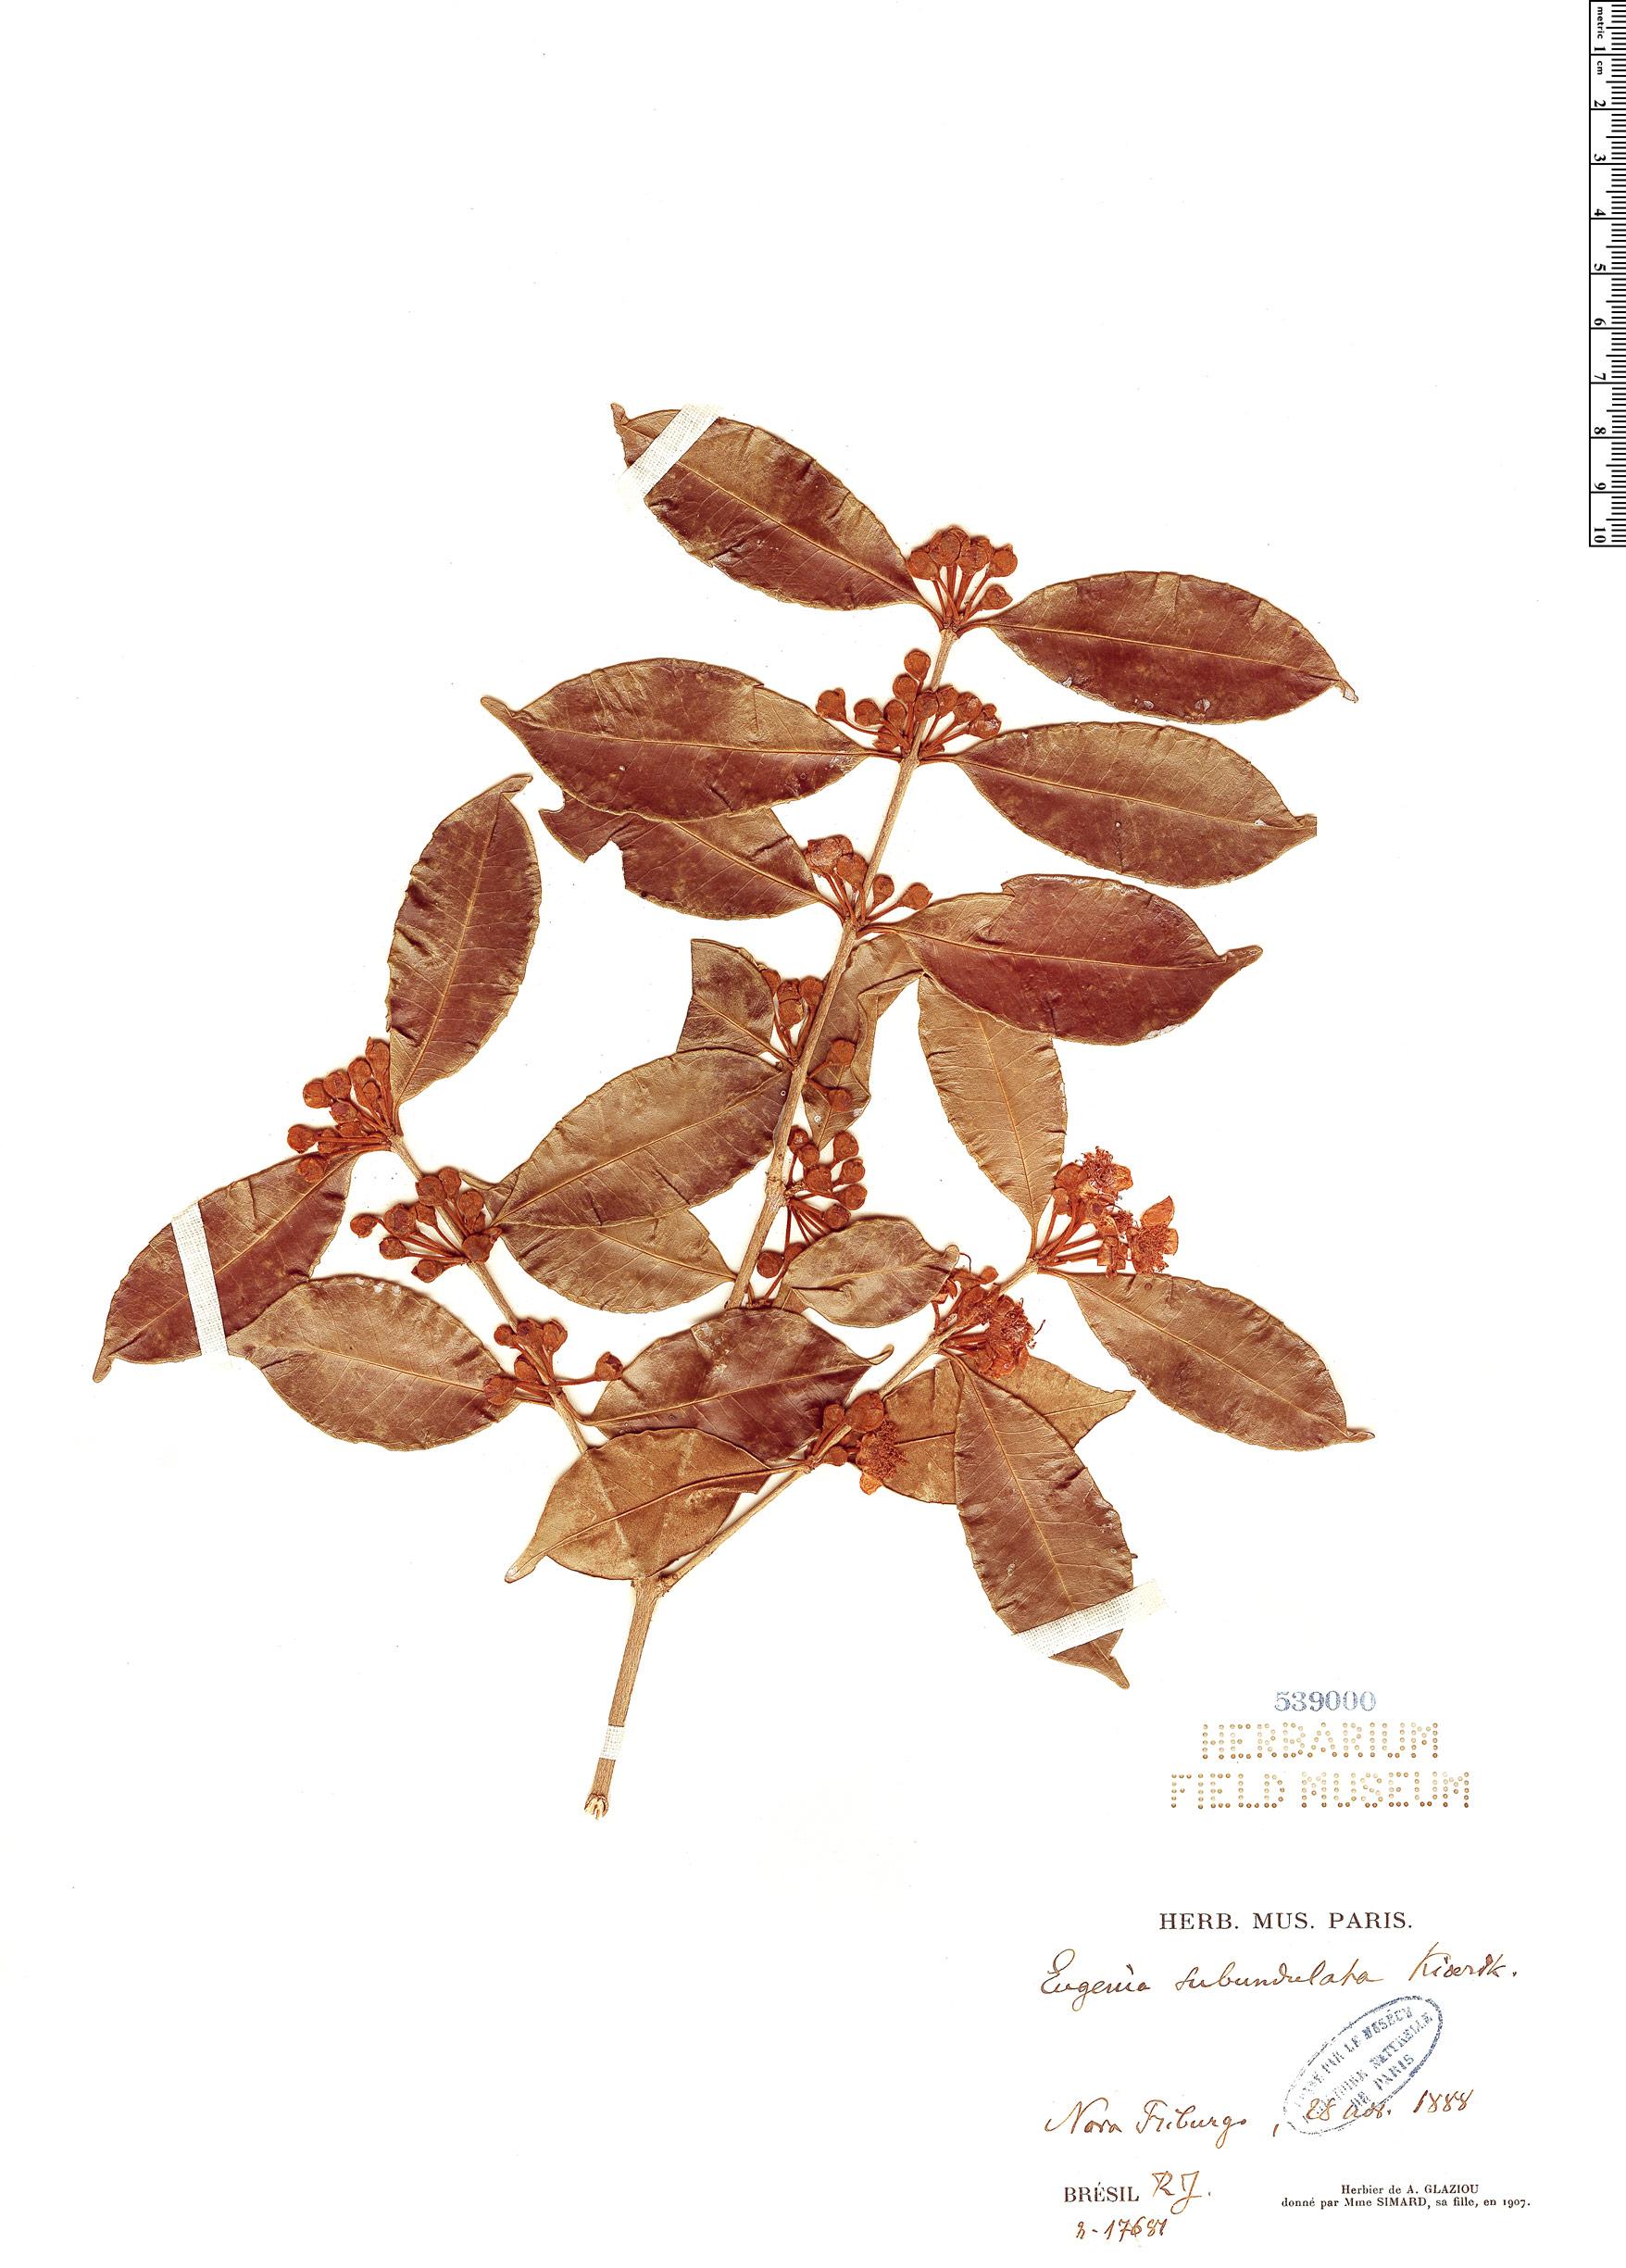 Specimen: Eugenia subundulata